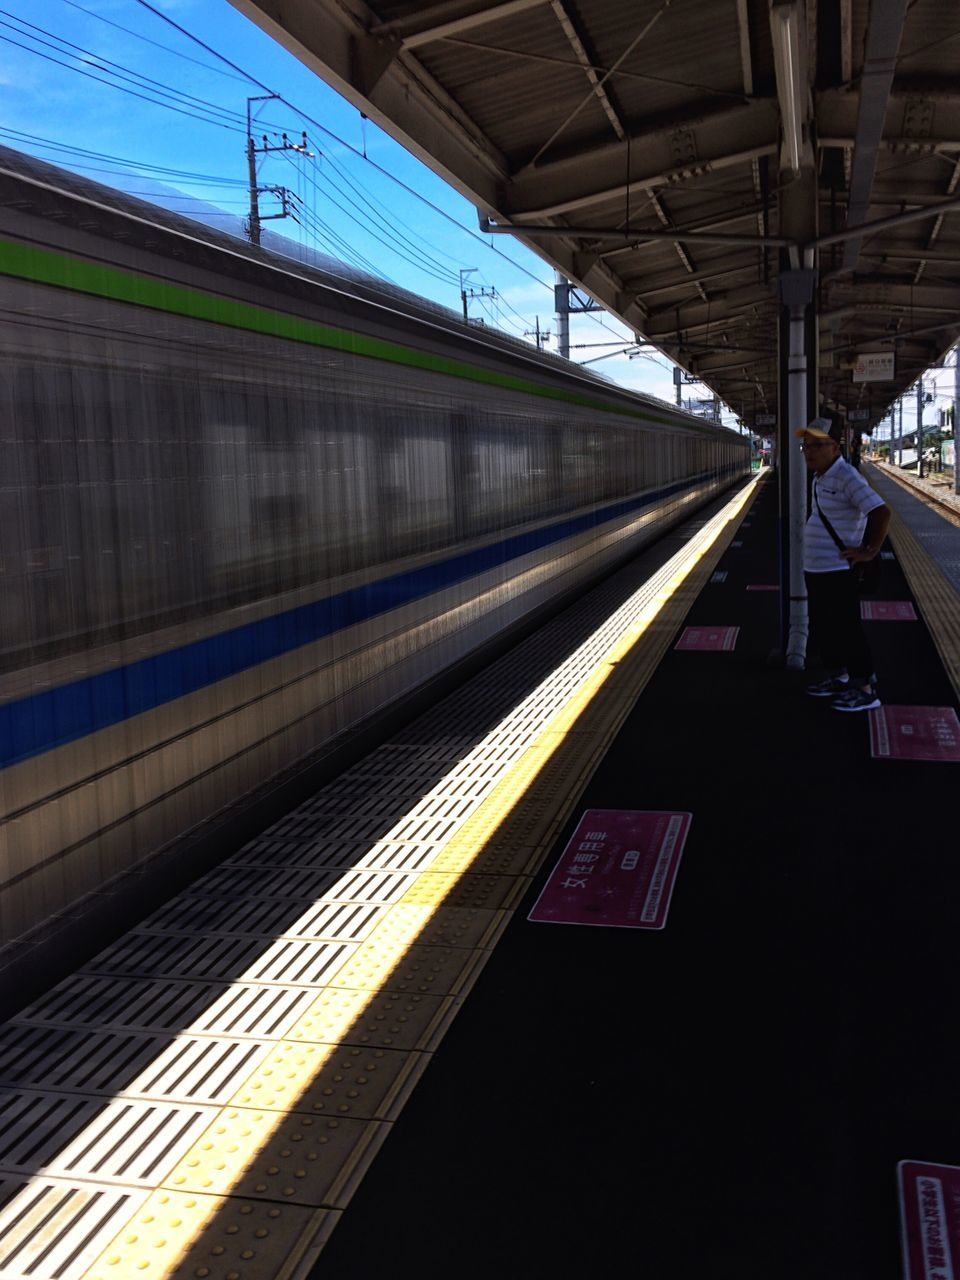 Blurred Motion Of Train On Railroad Station Platform